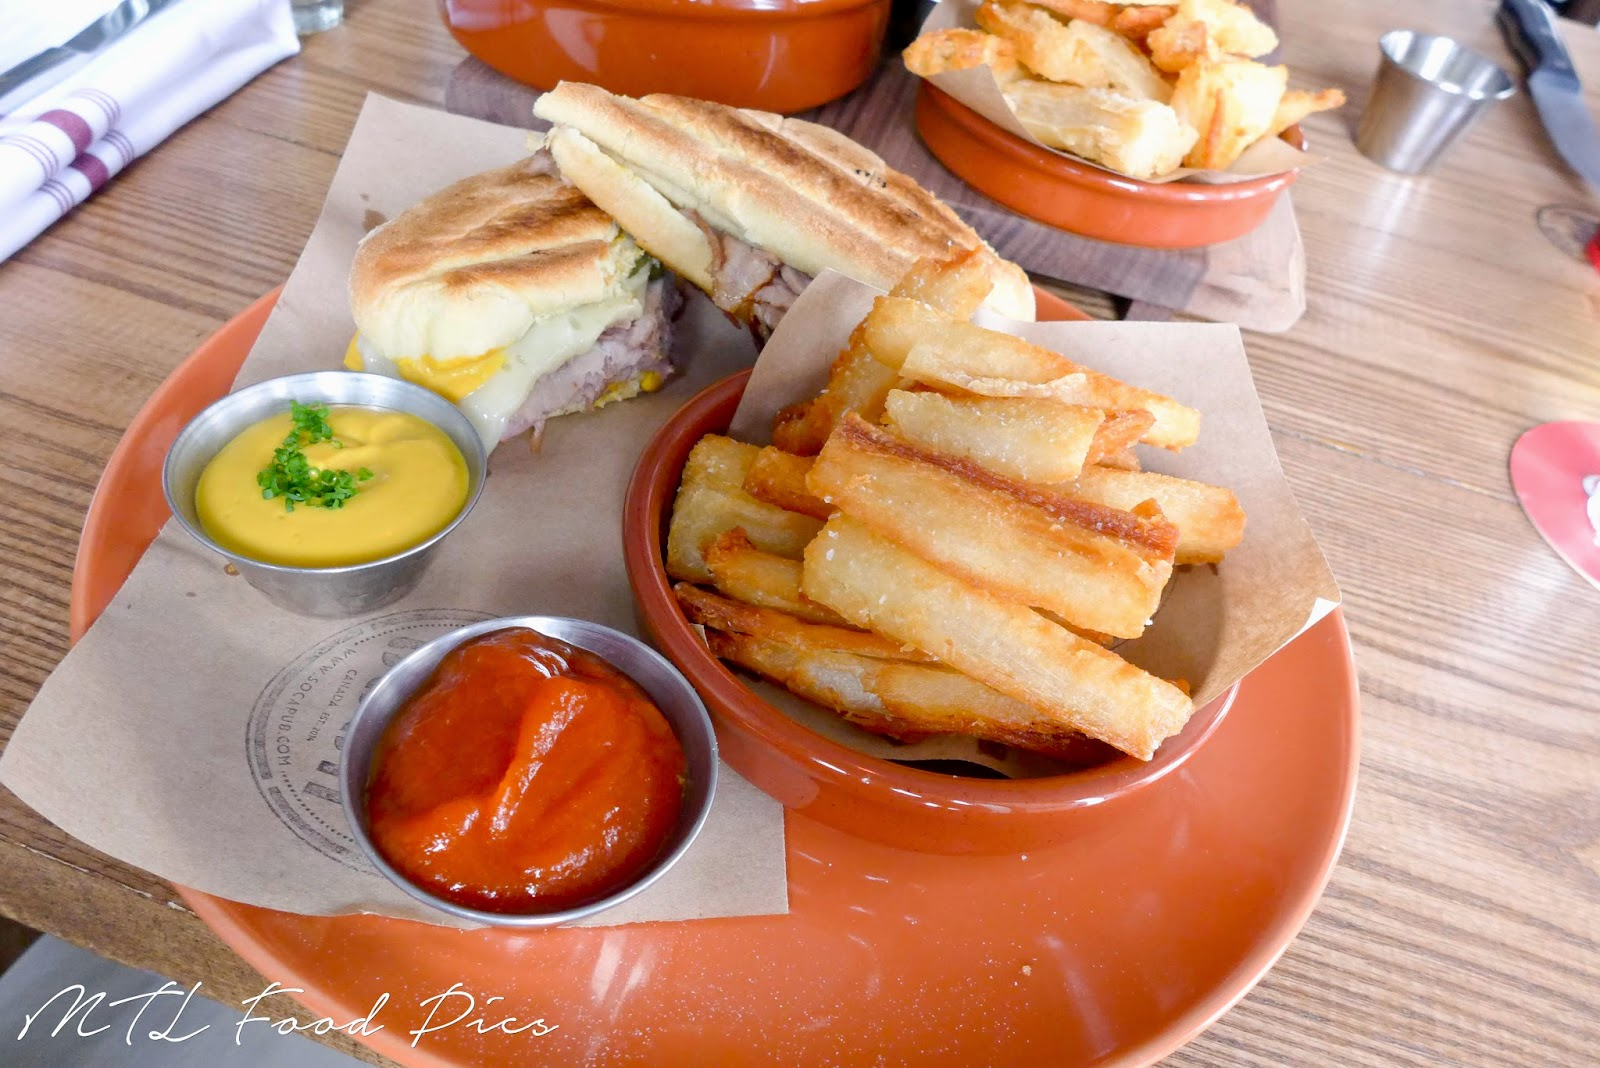 cuban sandwich with yuca fries - latin food